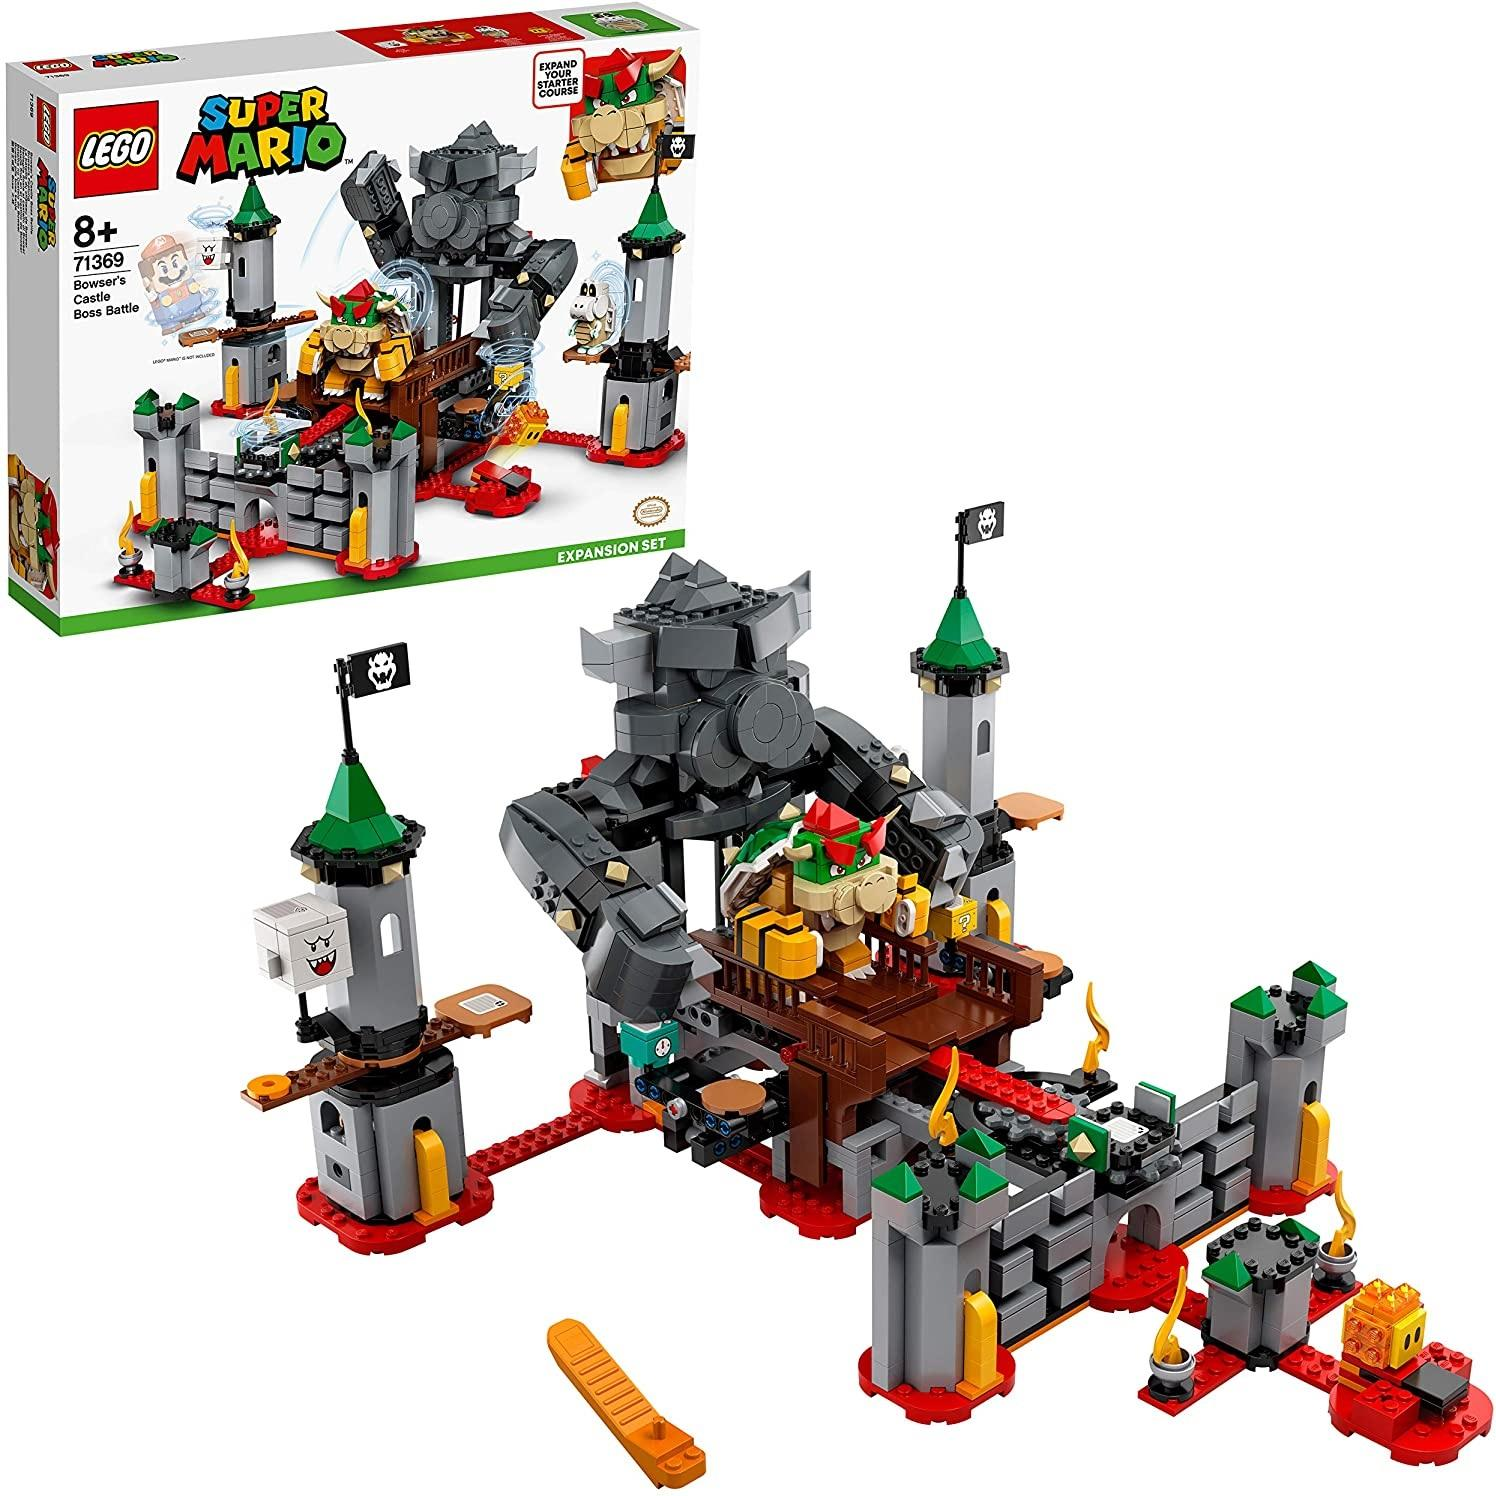 LEGO 乐高 超级马力欧 酷霸王城堡 71369